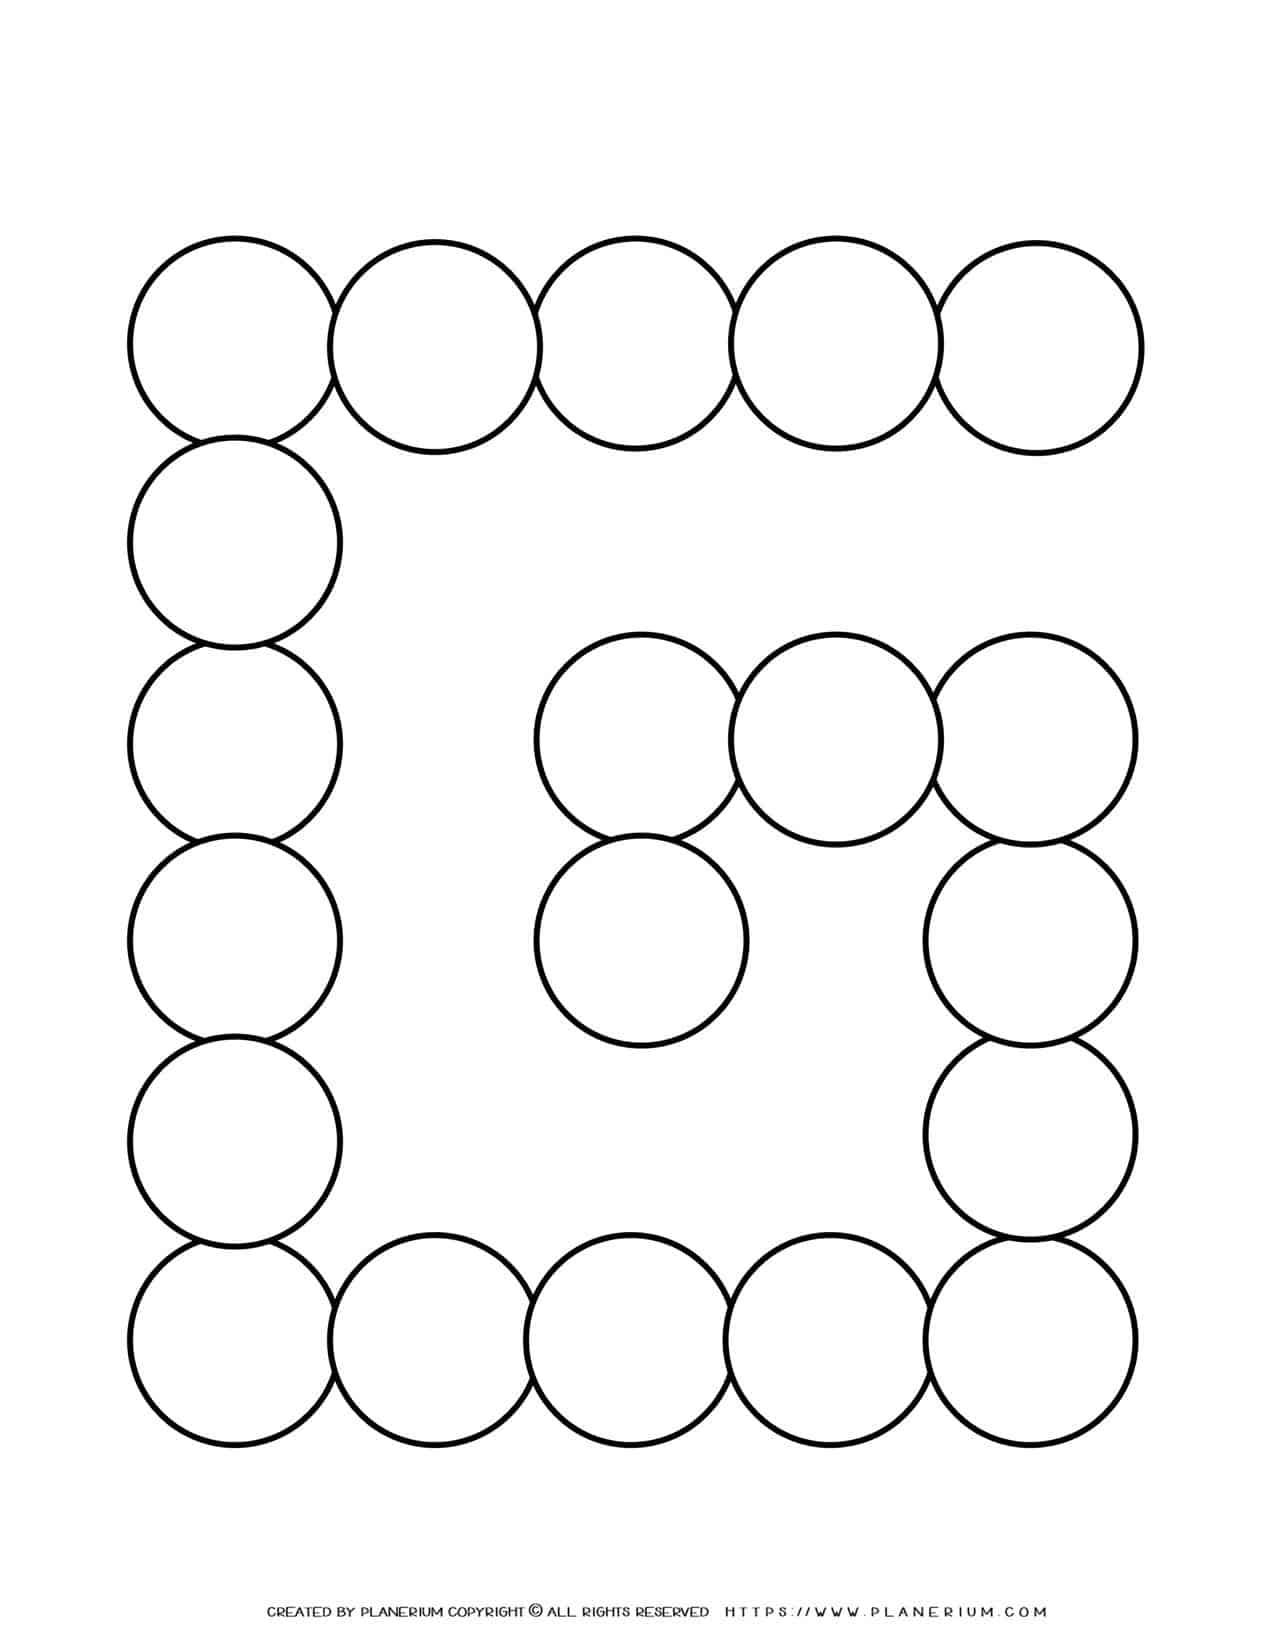 Sequence Chart Template - Twenty Circles on a G Shape   Planerium